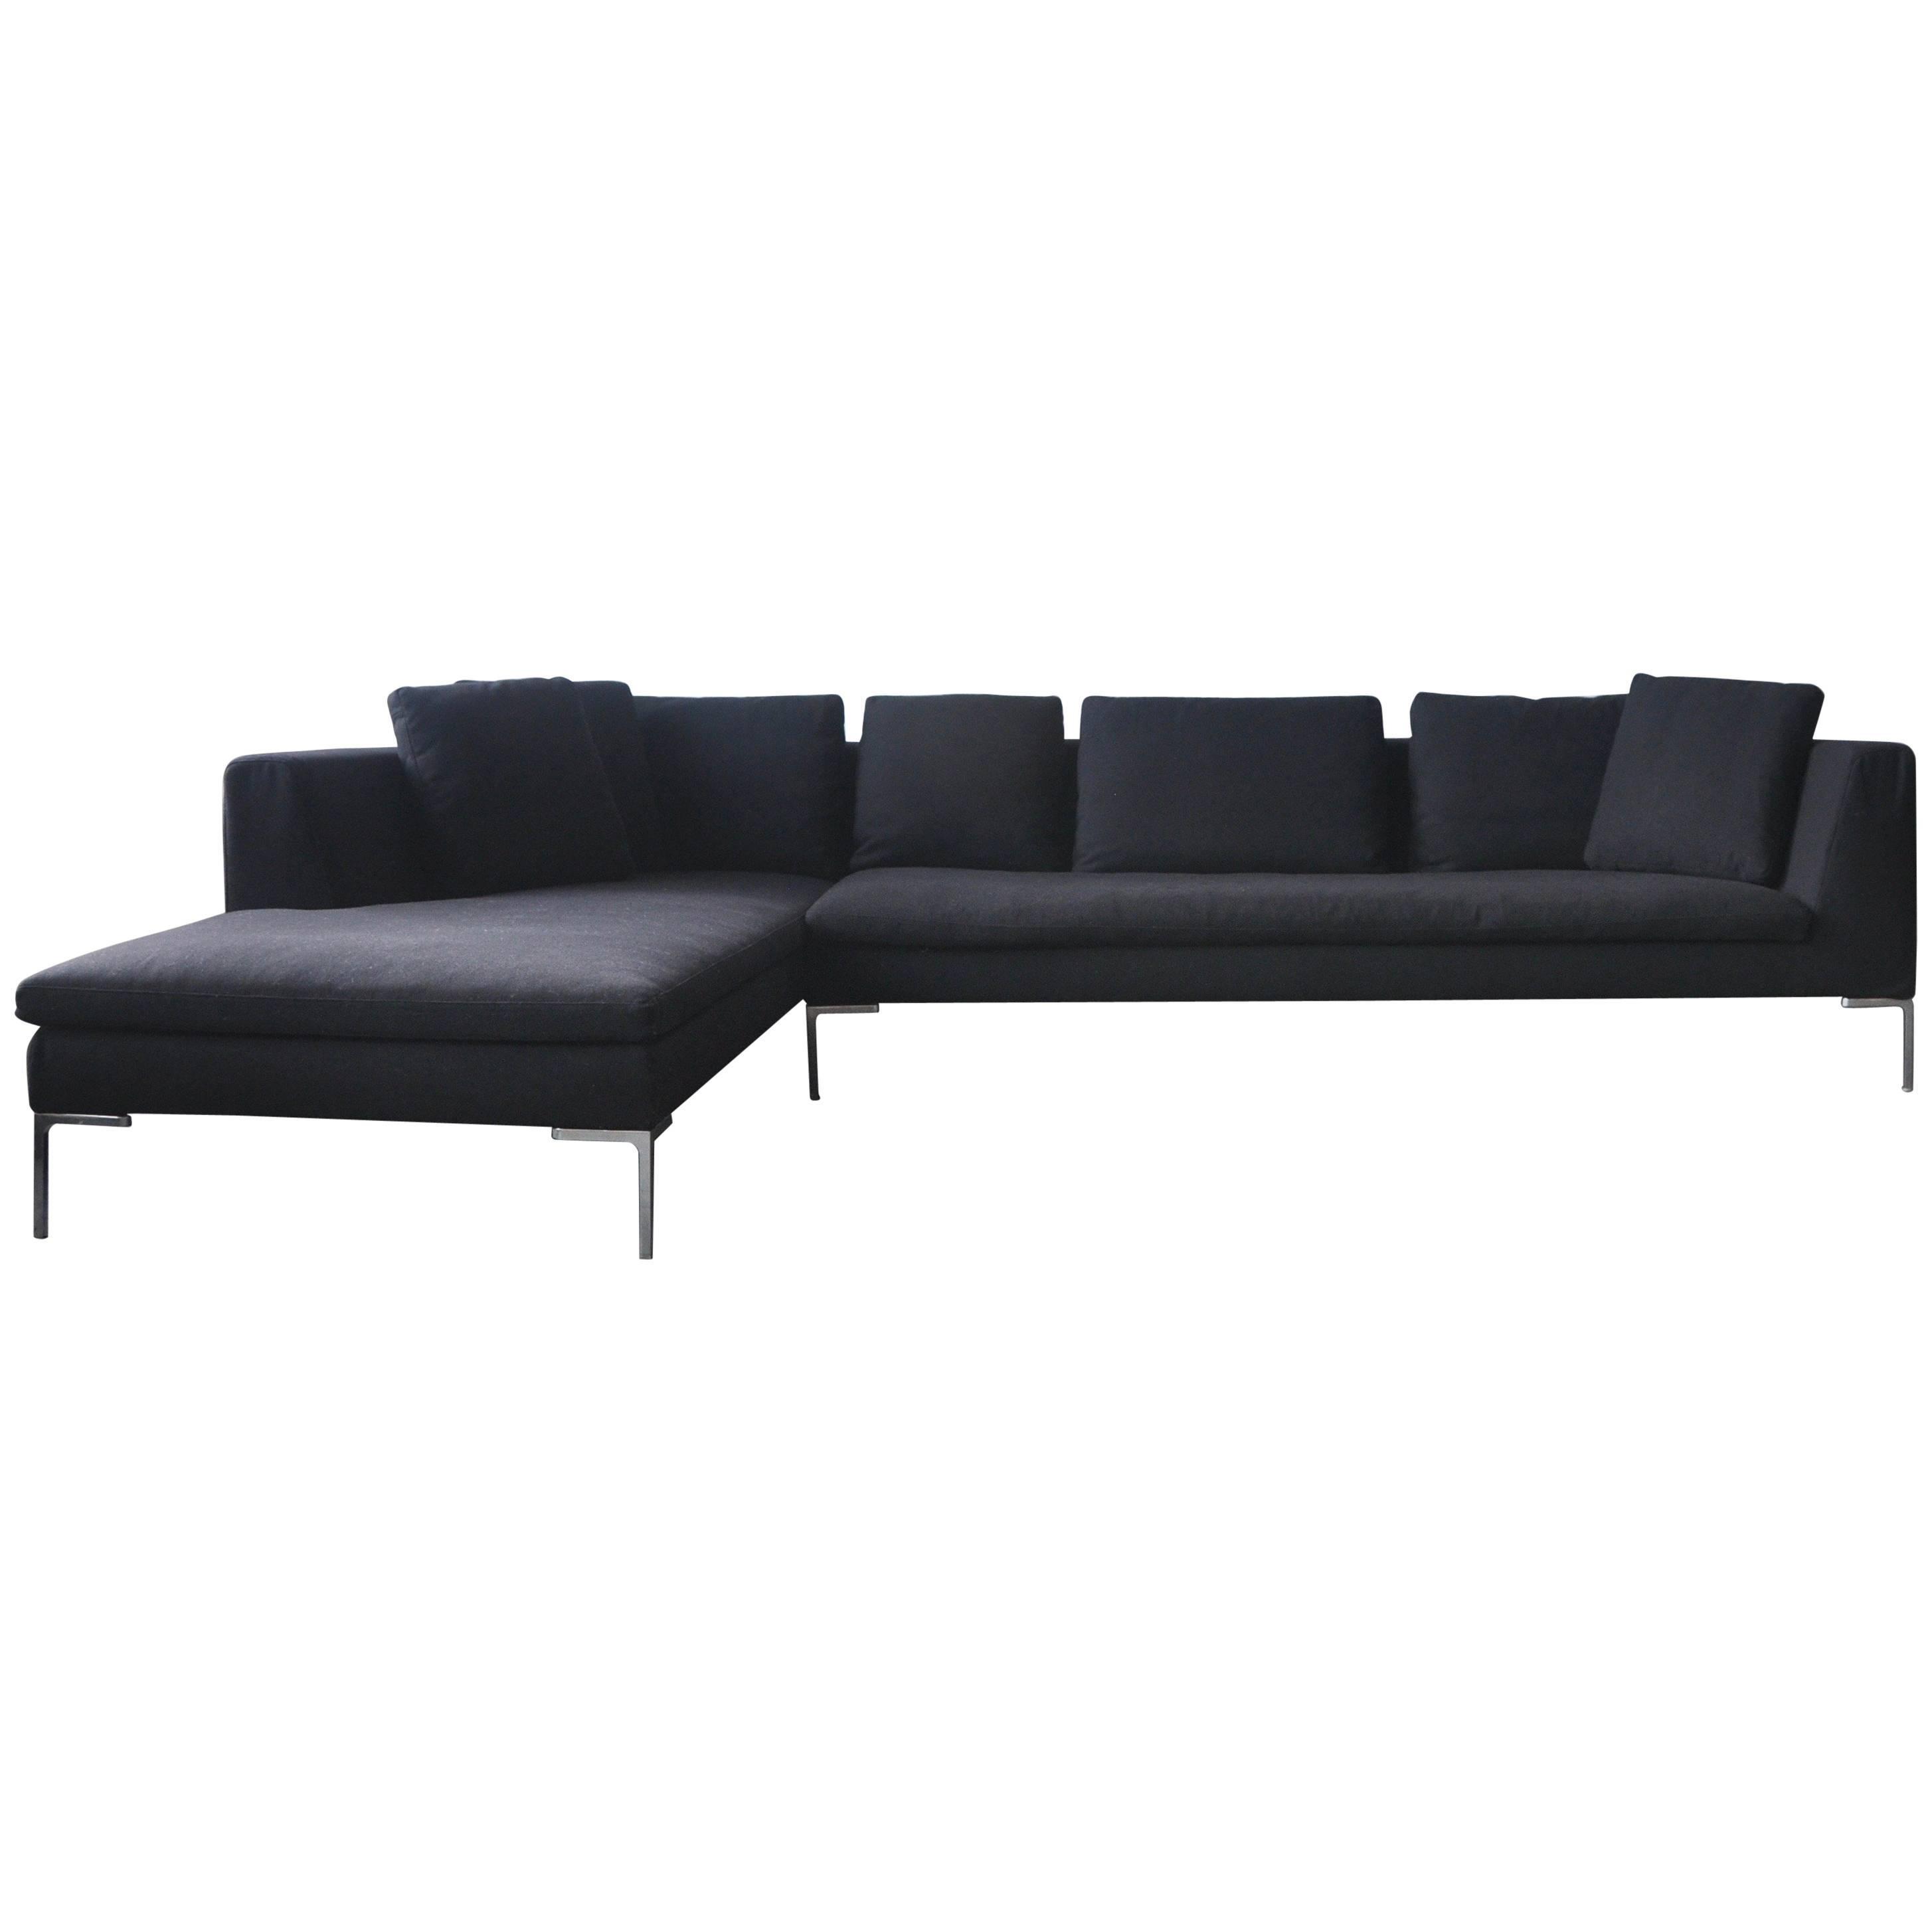 b and b italia charles sofa by antonio citterio for sale at 1stdibs rh 1stdibs com